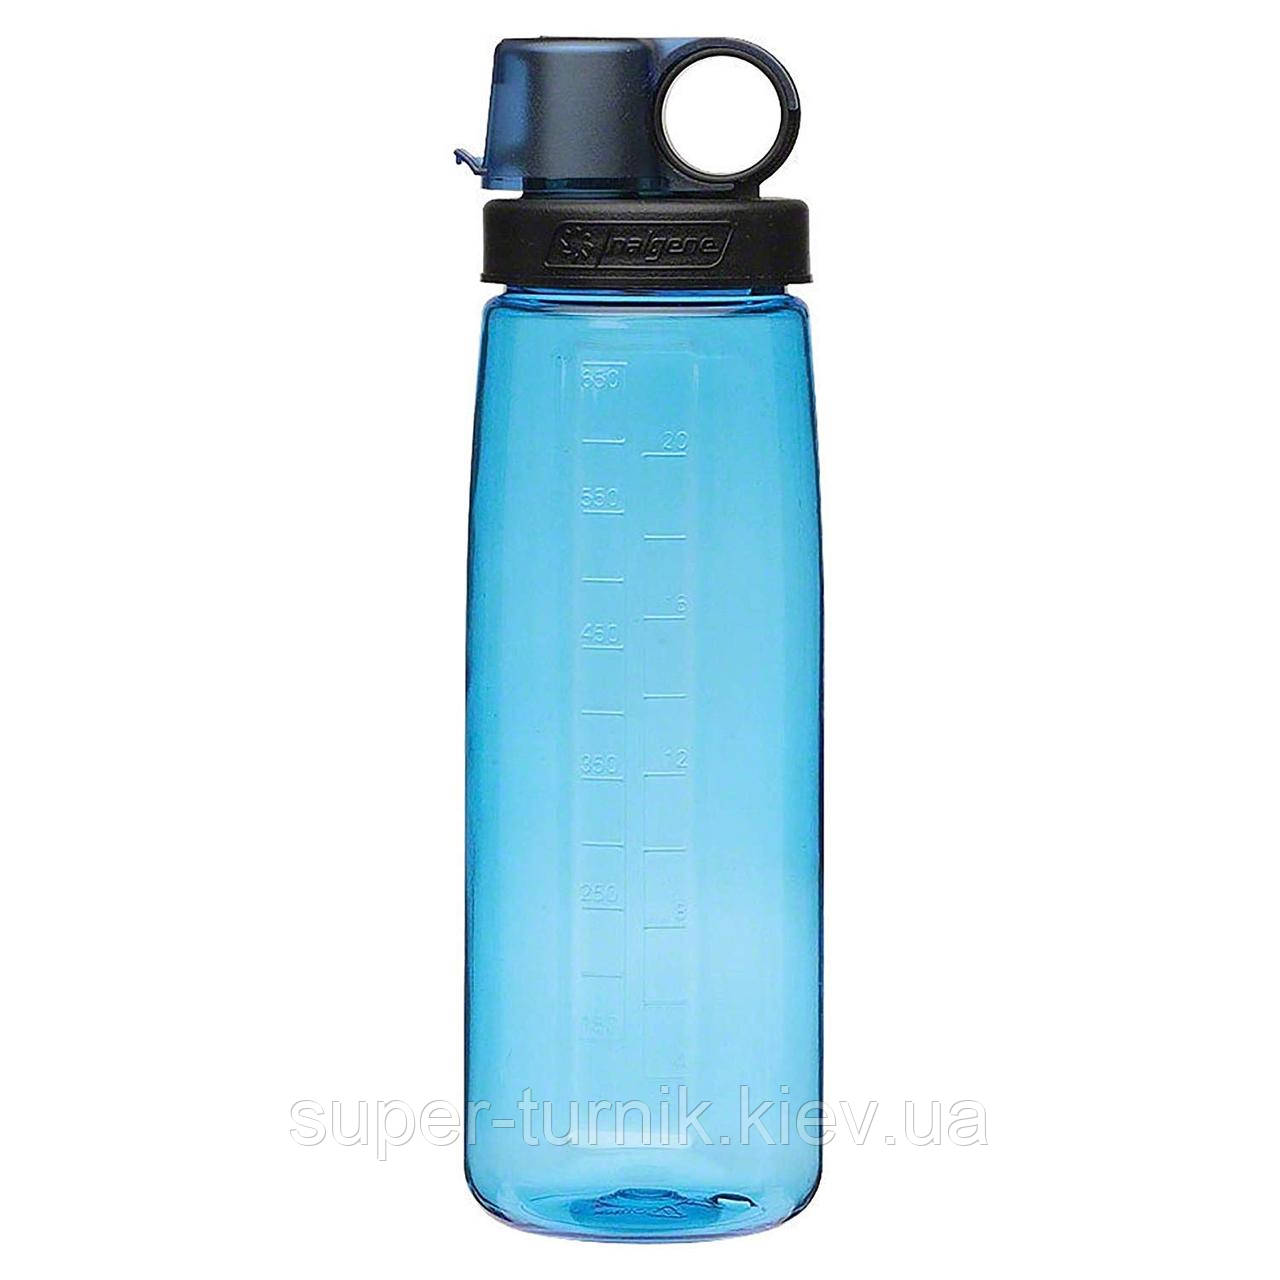 Бутылка для воды Nalgene OTG 650 мл. Blue